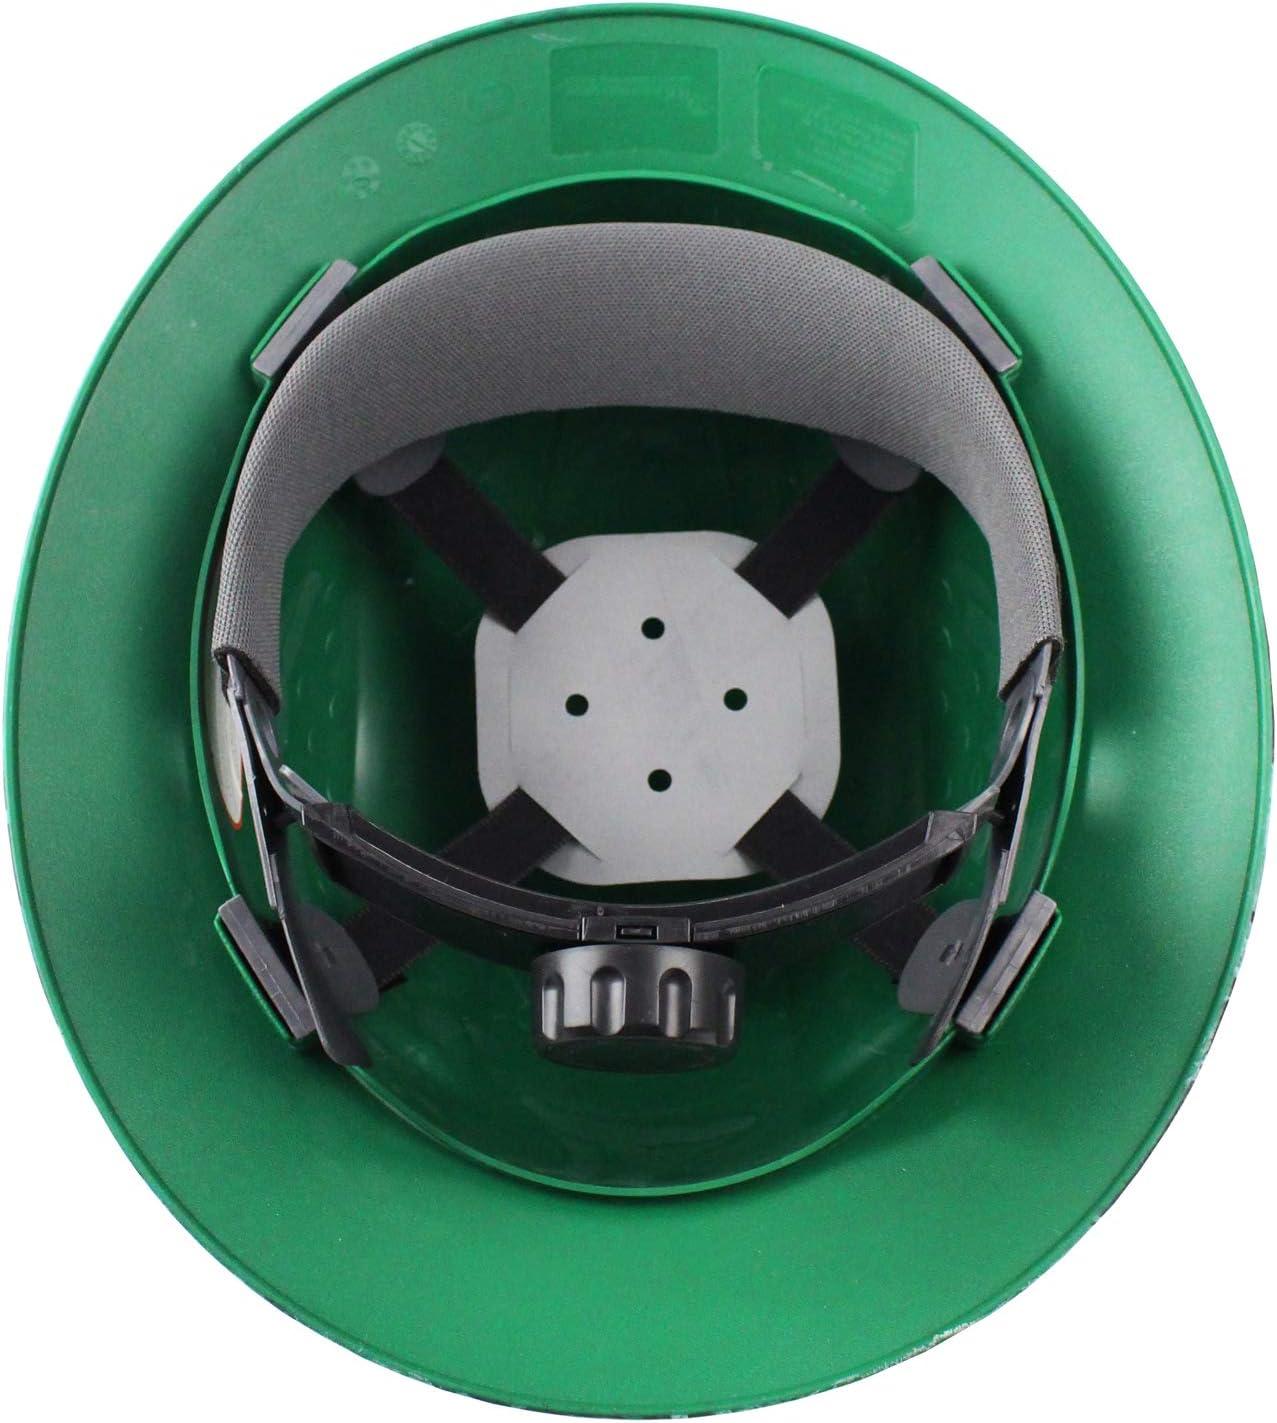 1 EA, Brown RK Safety RK-HP44-DESIGN Hard Hat Brim Style with 4 Point Ratchet Suspension